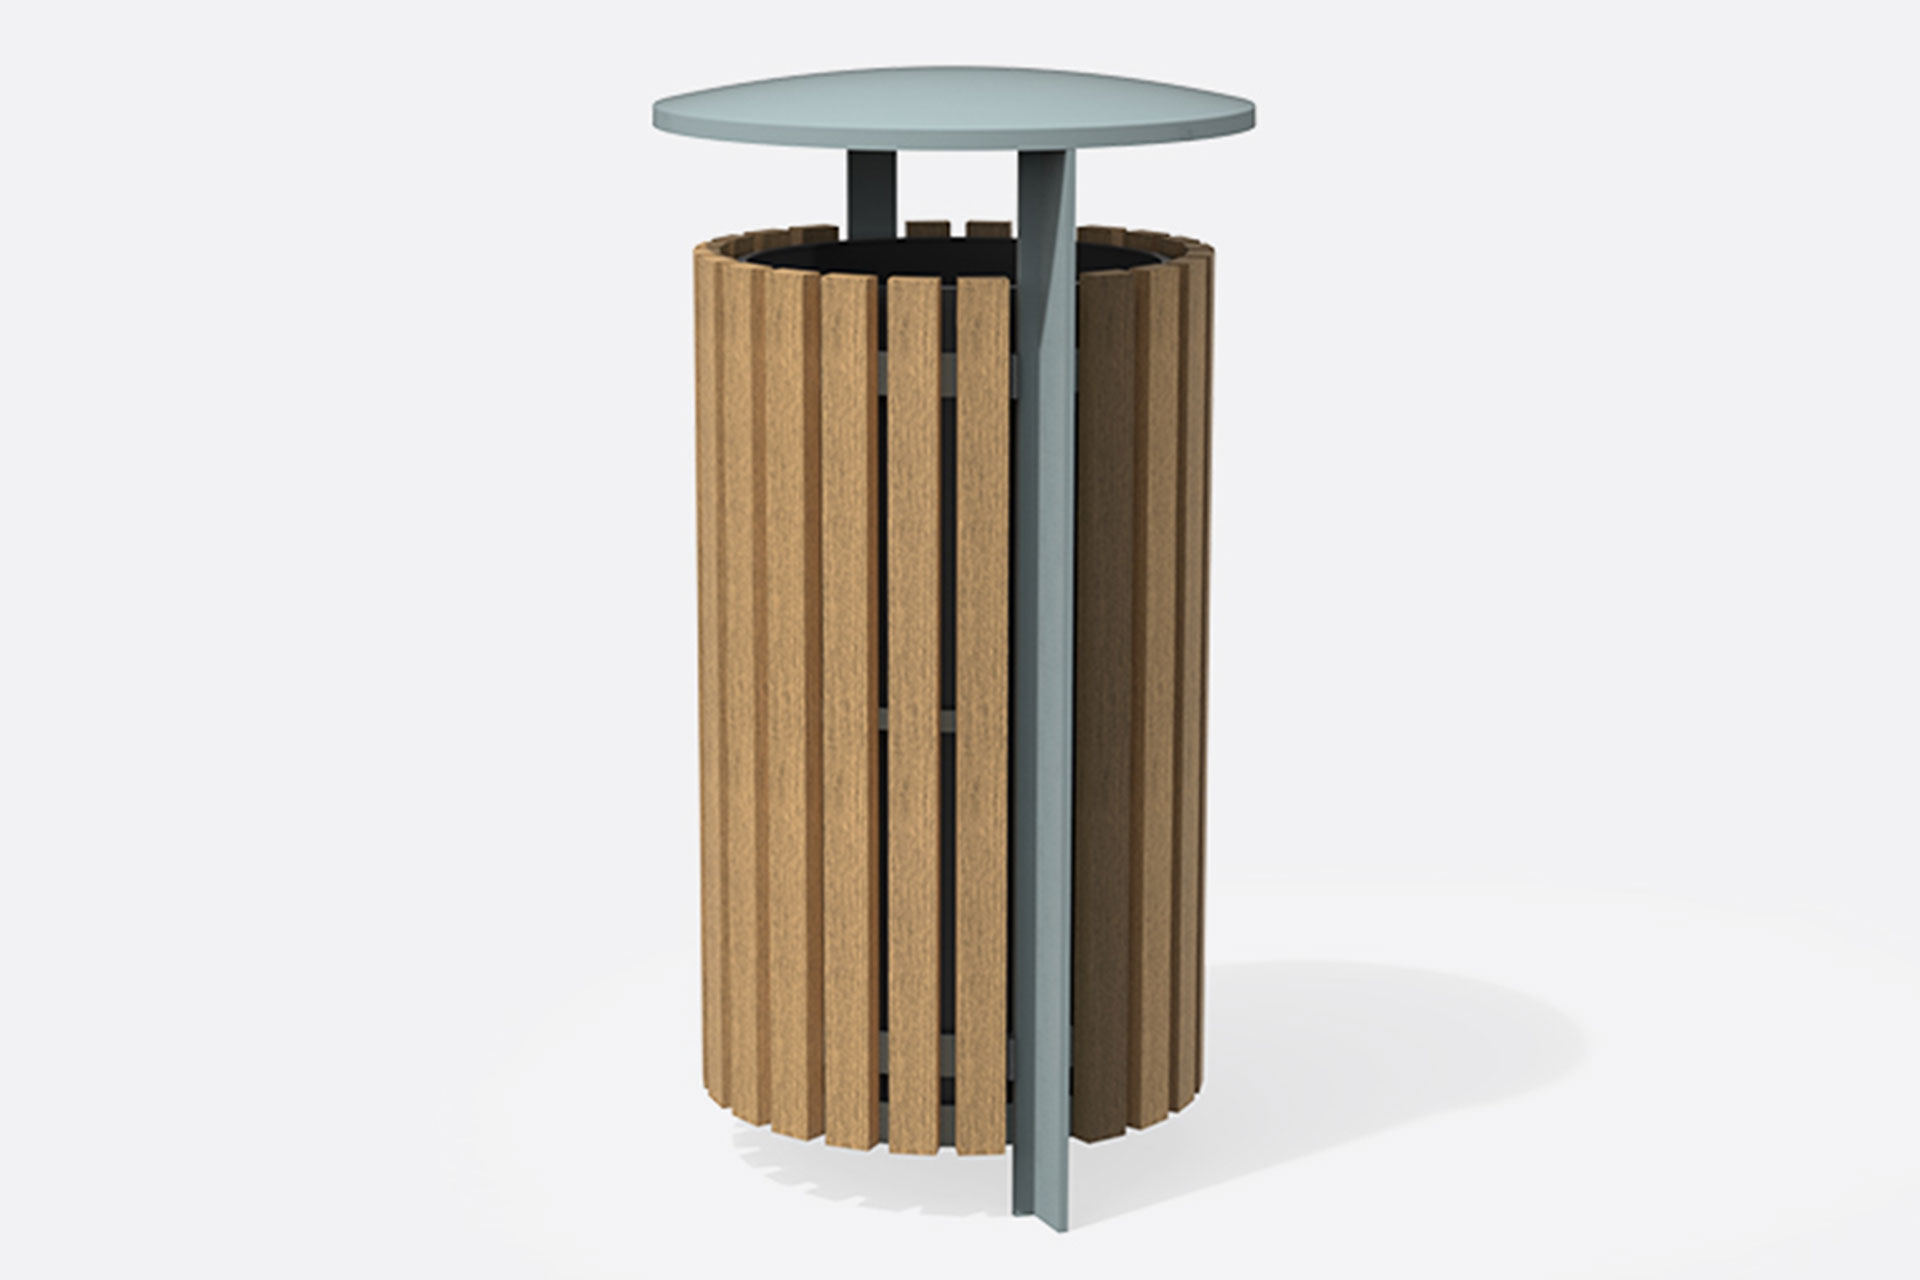 UrbanObjekts Axis Abfallbehälter